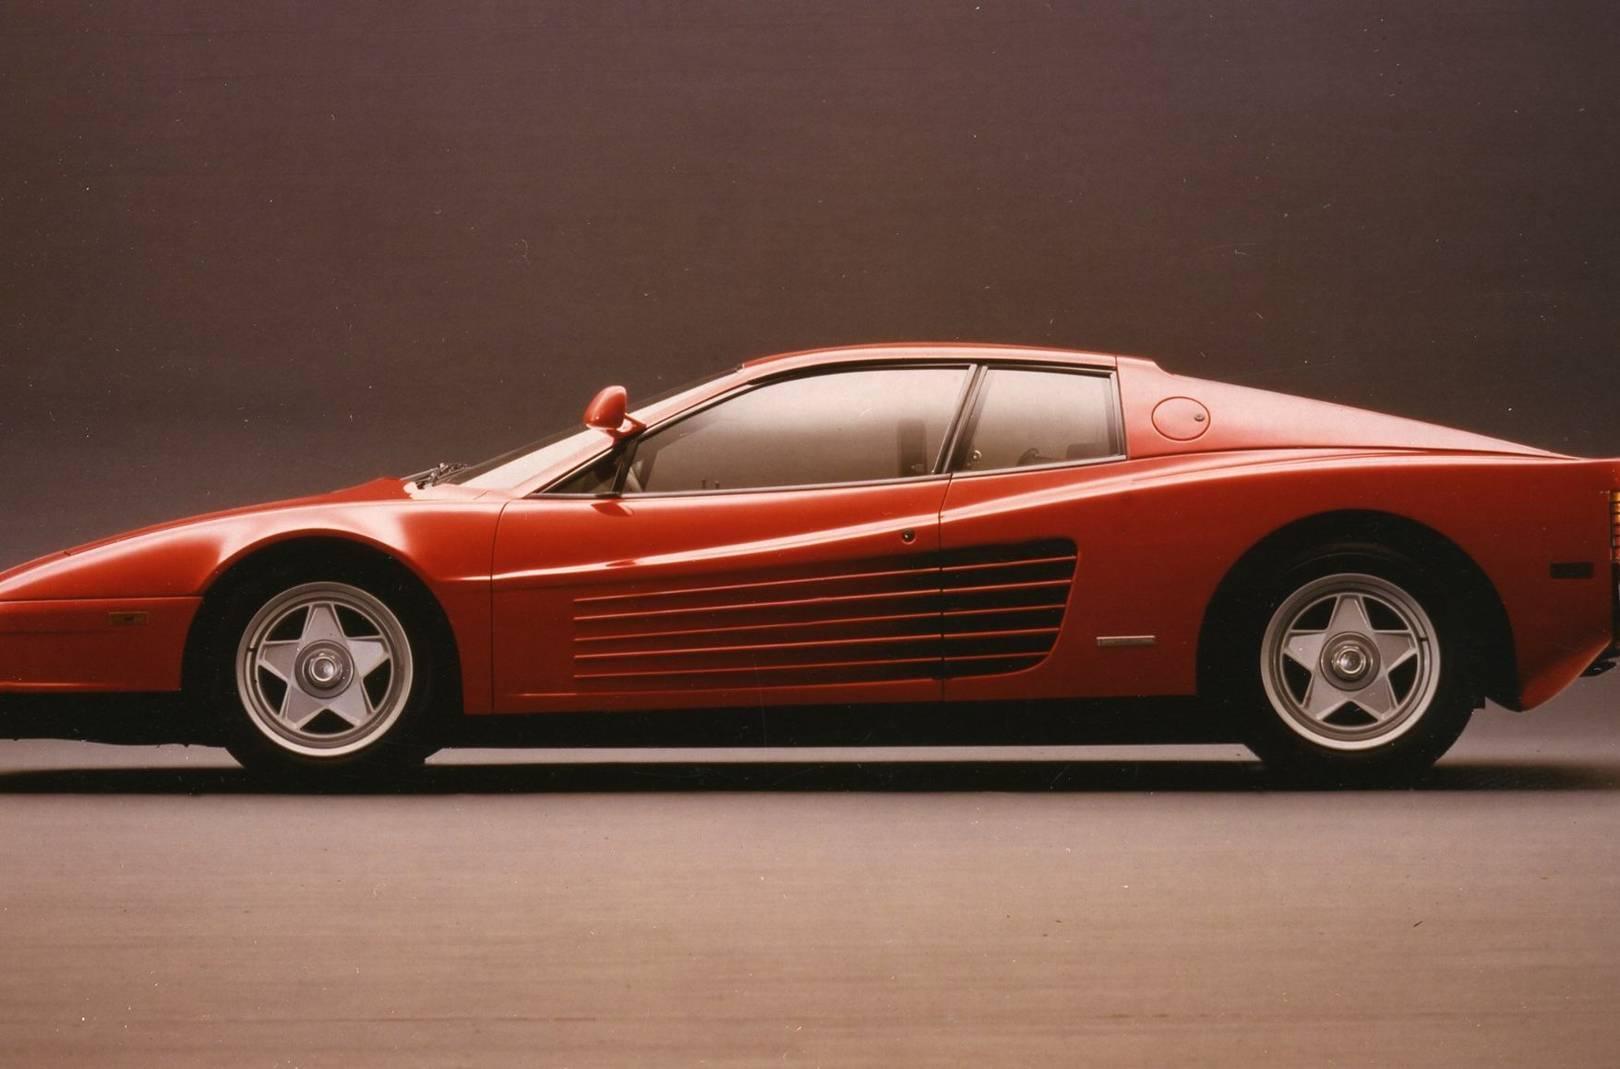 scotts testarossa sale for states on united cars ferrari valley in